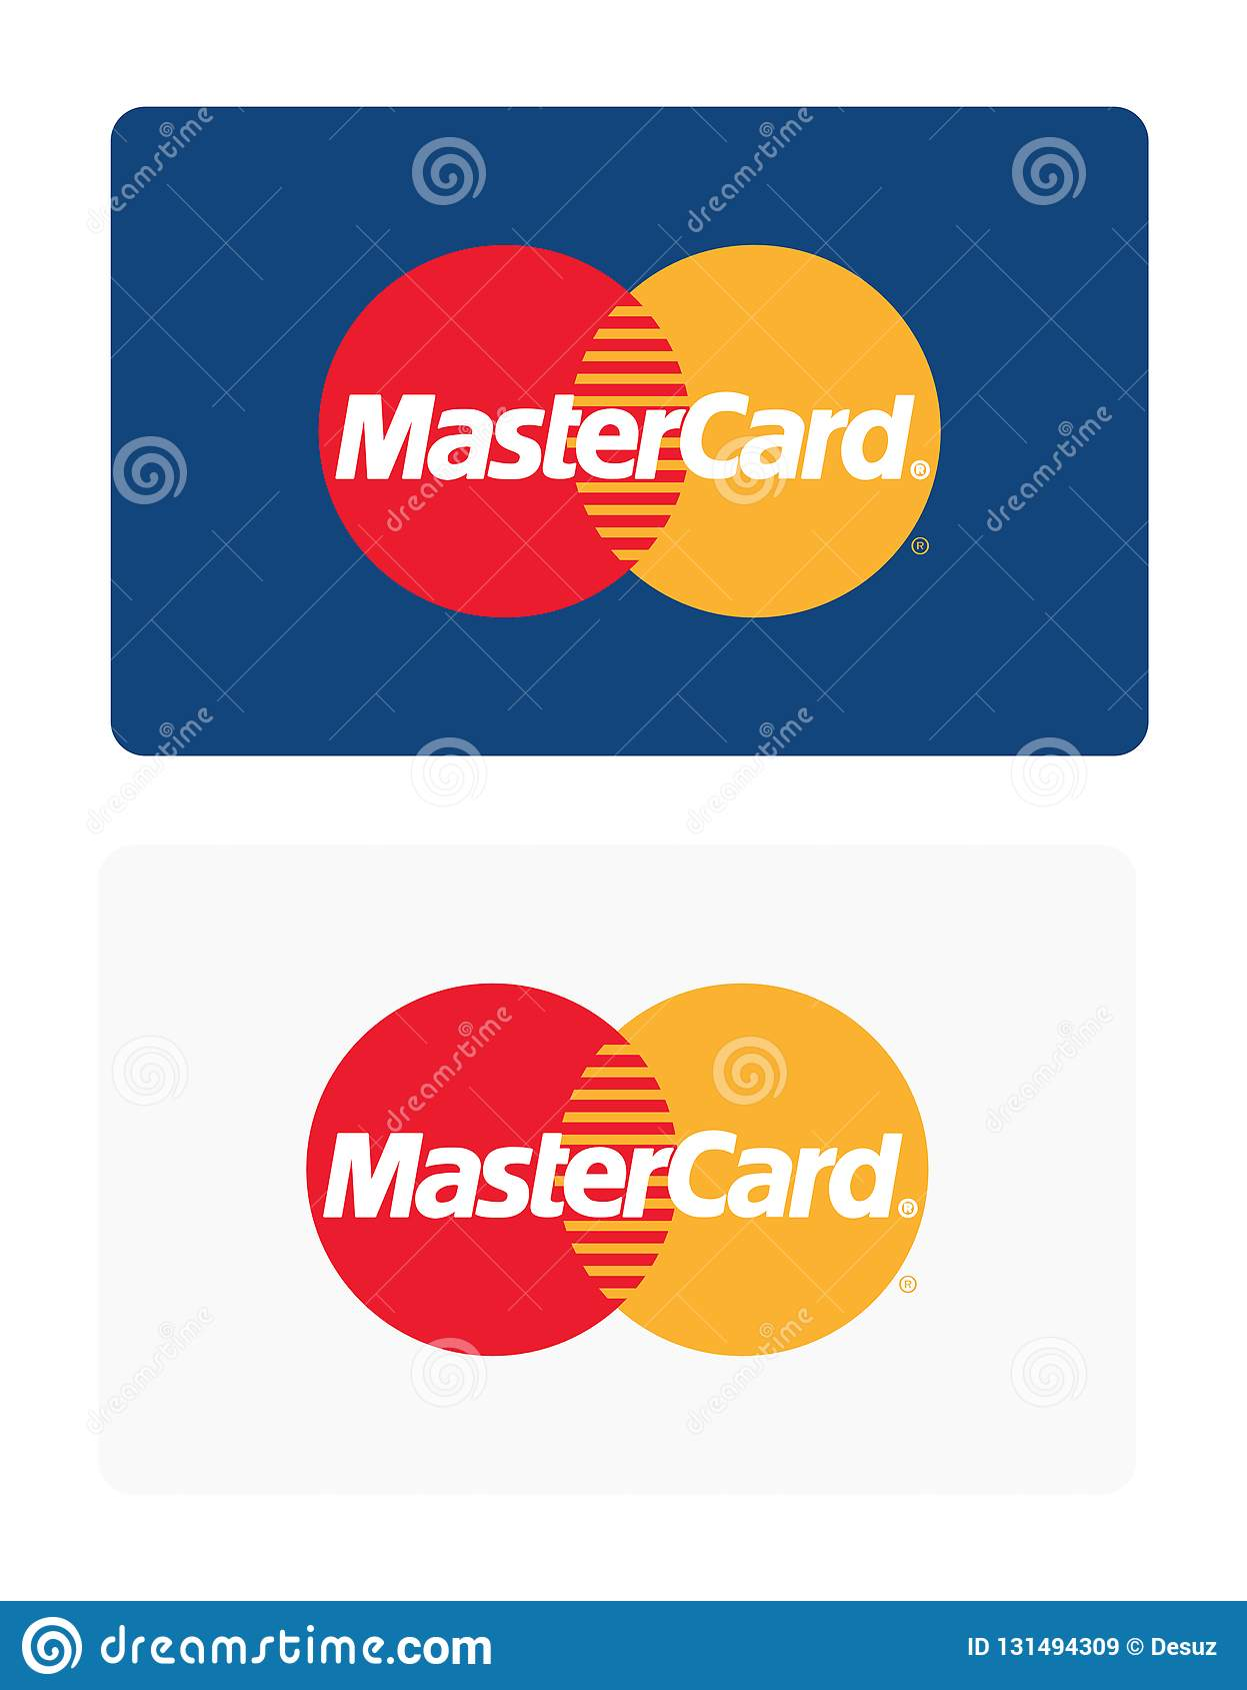 Mastercard logo editorial stock image. Illustration of banking